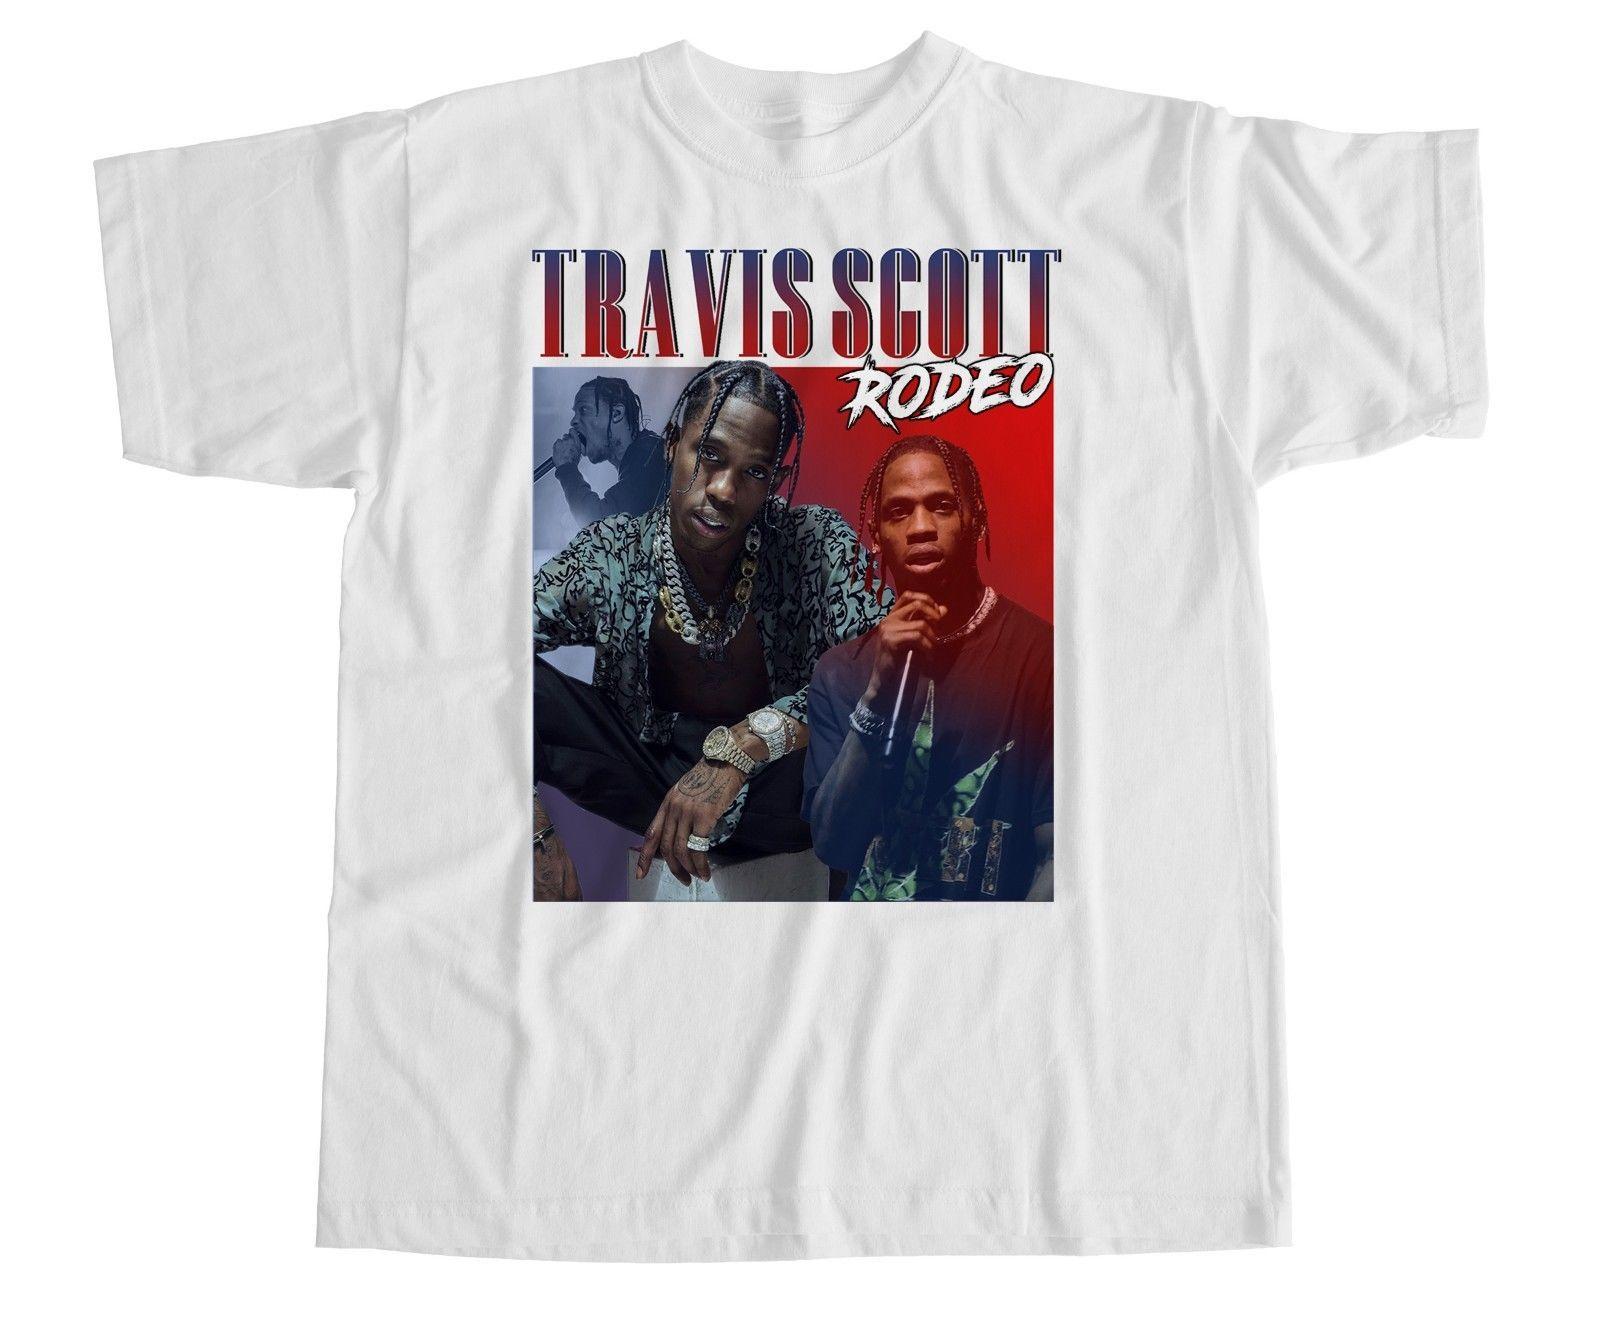 f1c9a6bfffcf4 Travis Scott T Shirt Homage XXX Rodeo Kylie Hip Hop Tribute Vintage Jenner